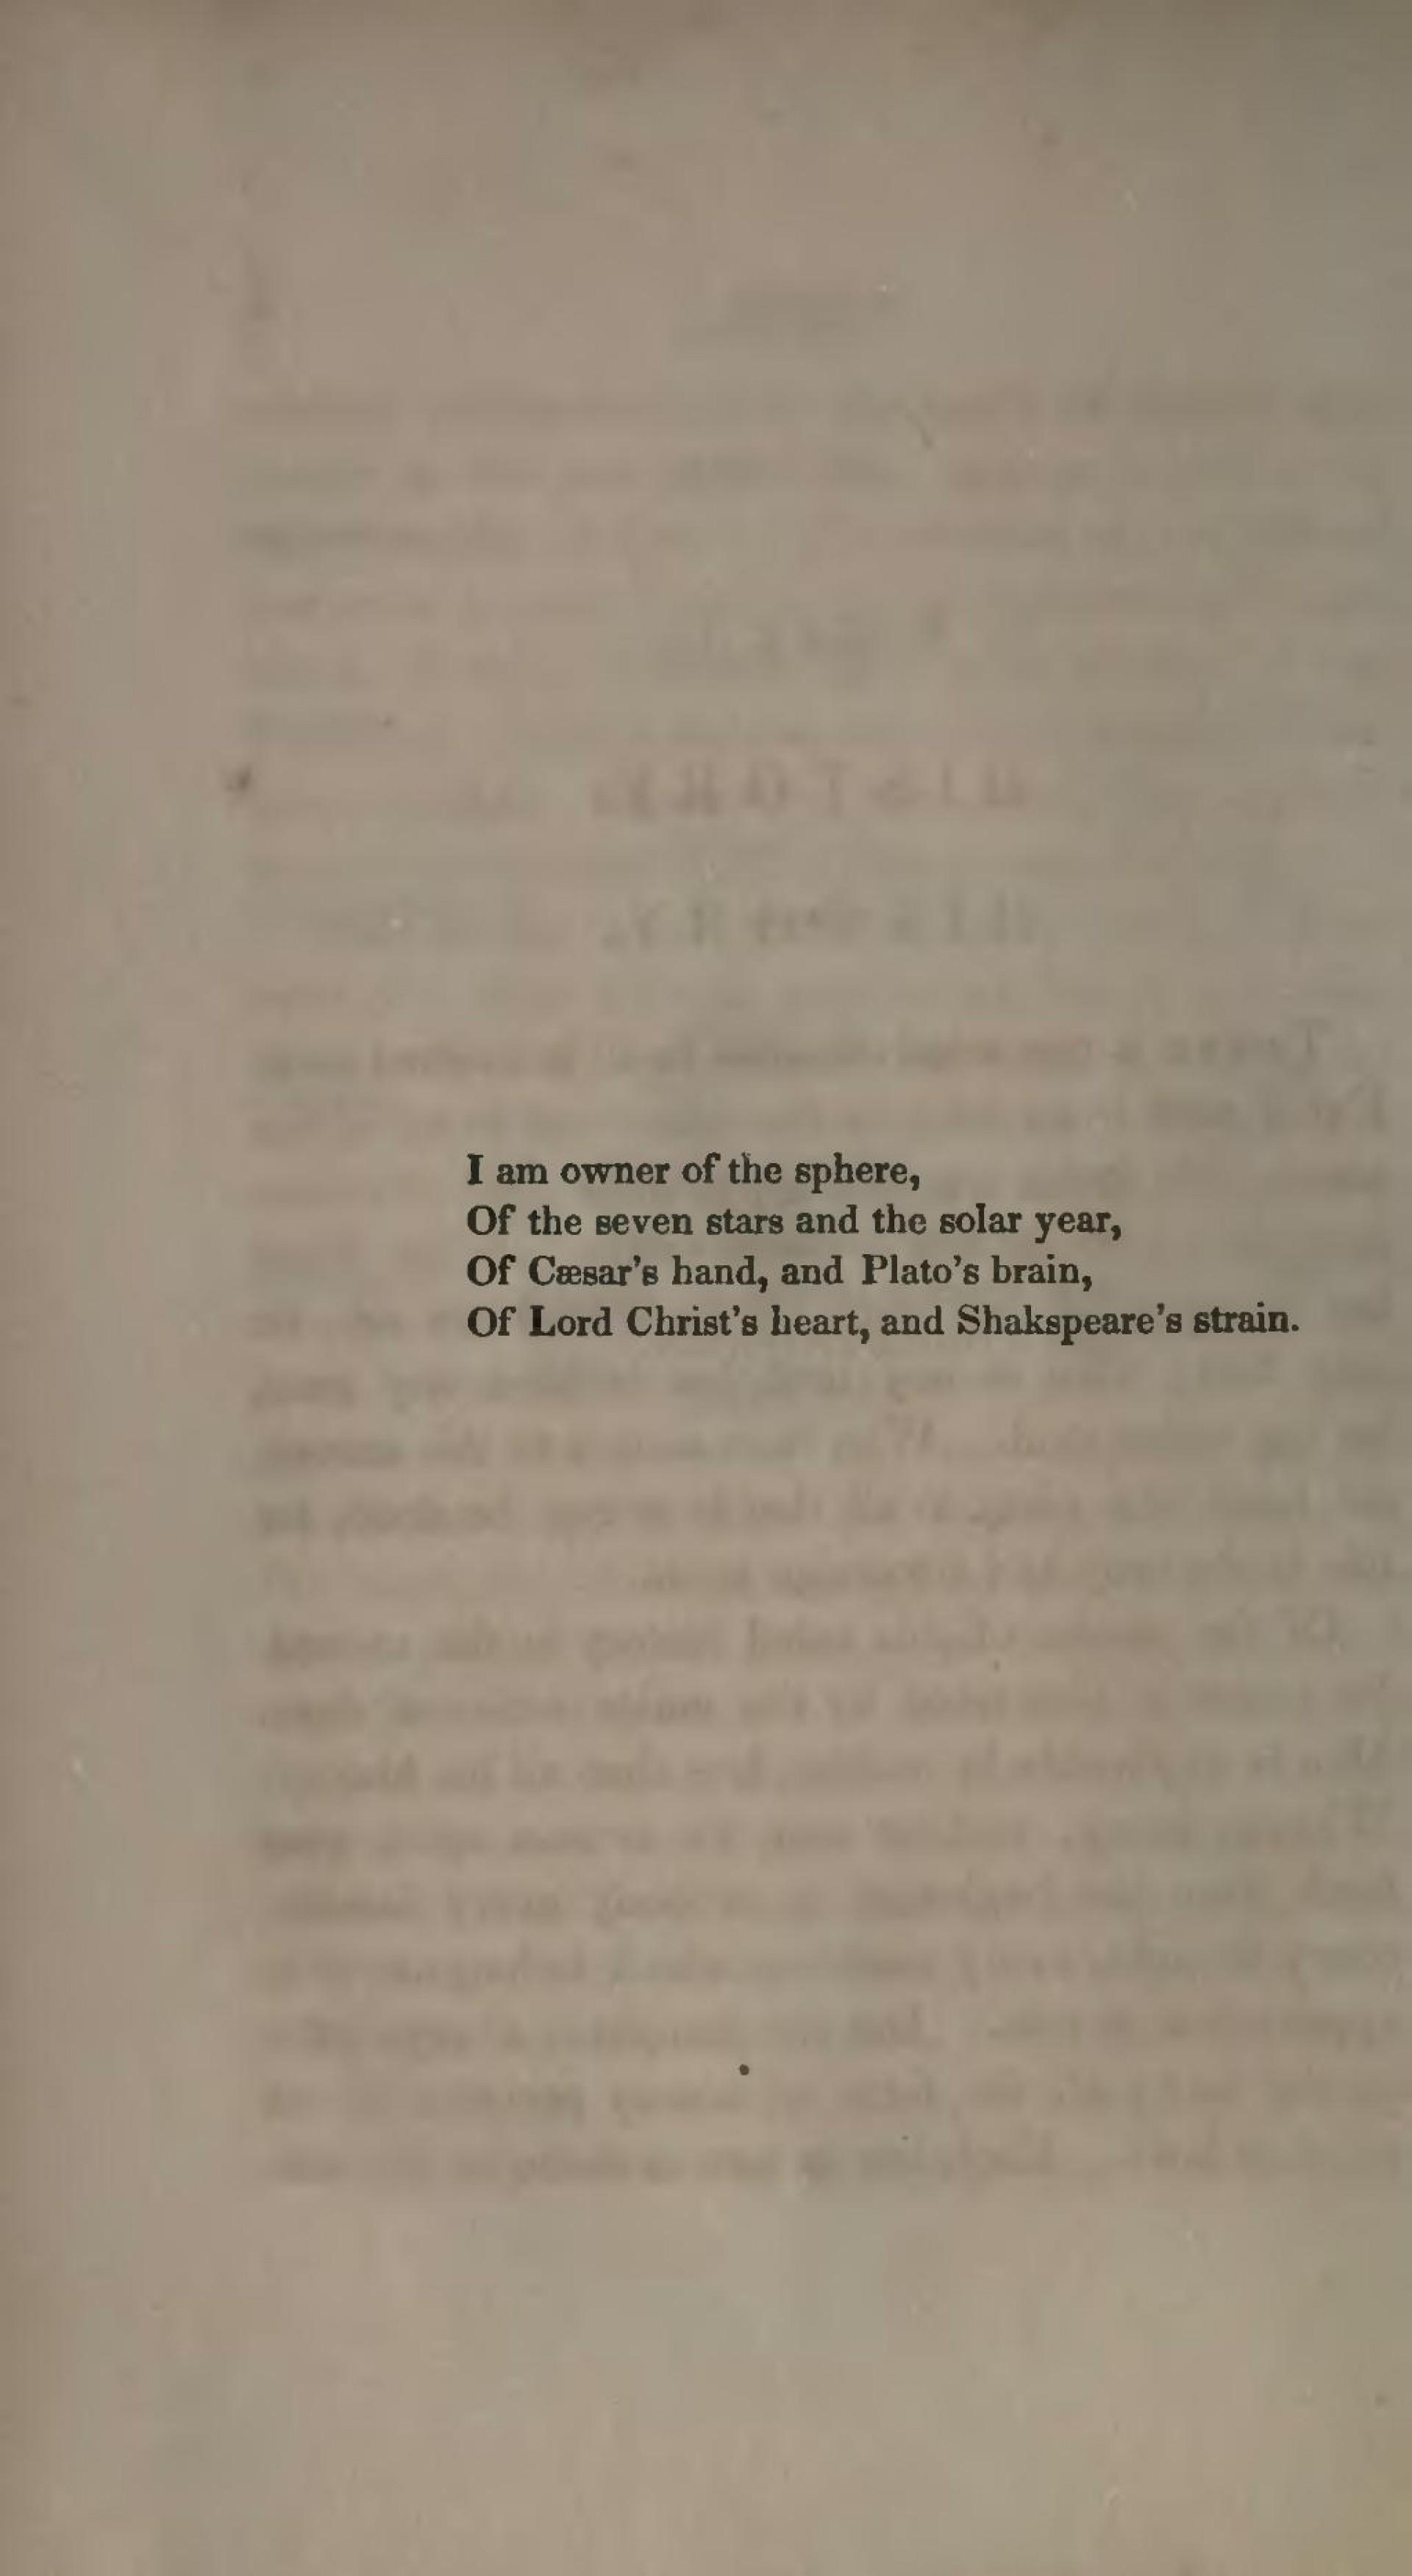 023 Essays First Series Page14 1024px Essays2c 28184729 Djvu Essay Stunning Emerson Pdf Shelburne Publisher 1920